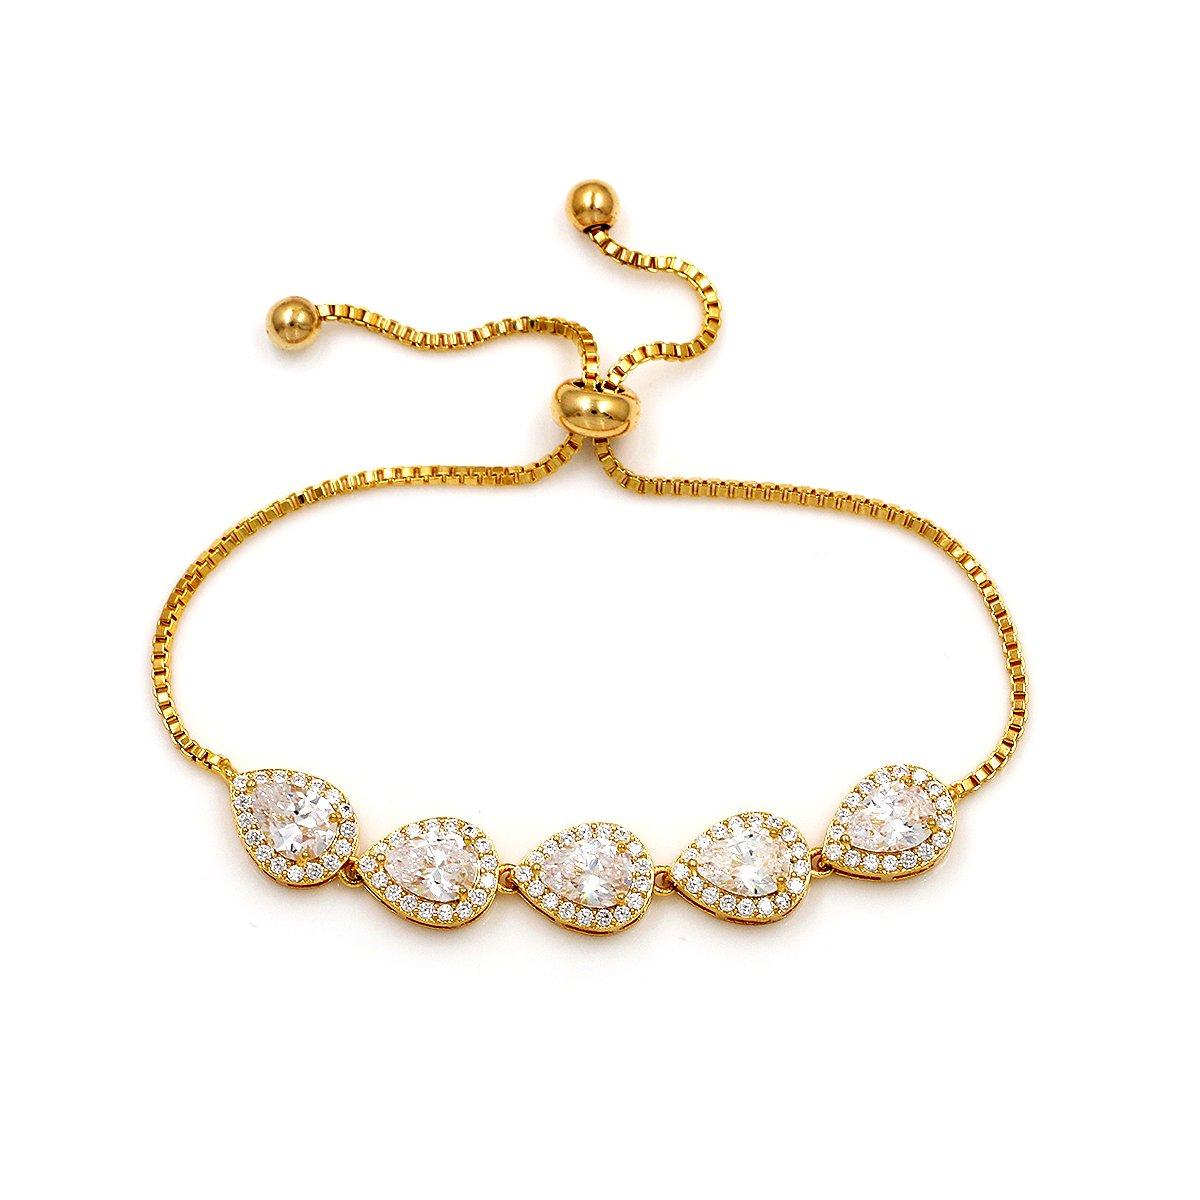 WeimanJewelry Cubic Zirconia CZ Wedding Bridal Pear Cut Adjustable Teardrop Chain Bracelet for Women Lady (Gold)